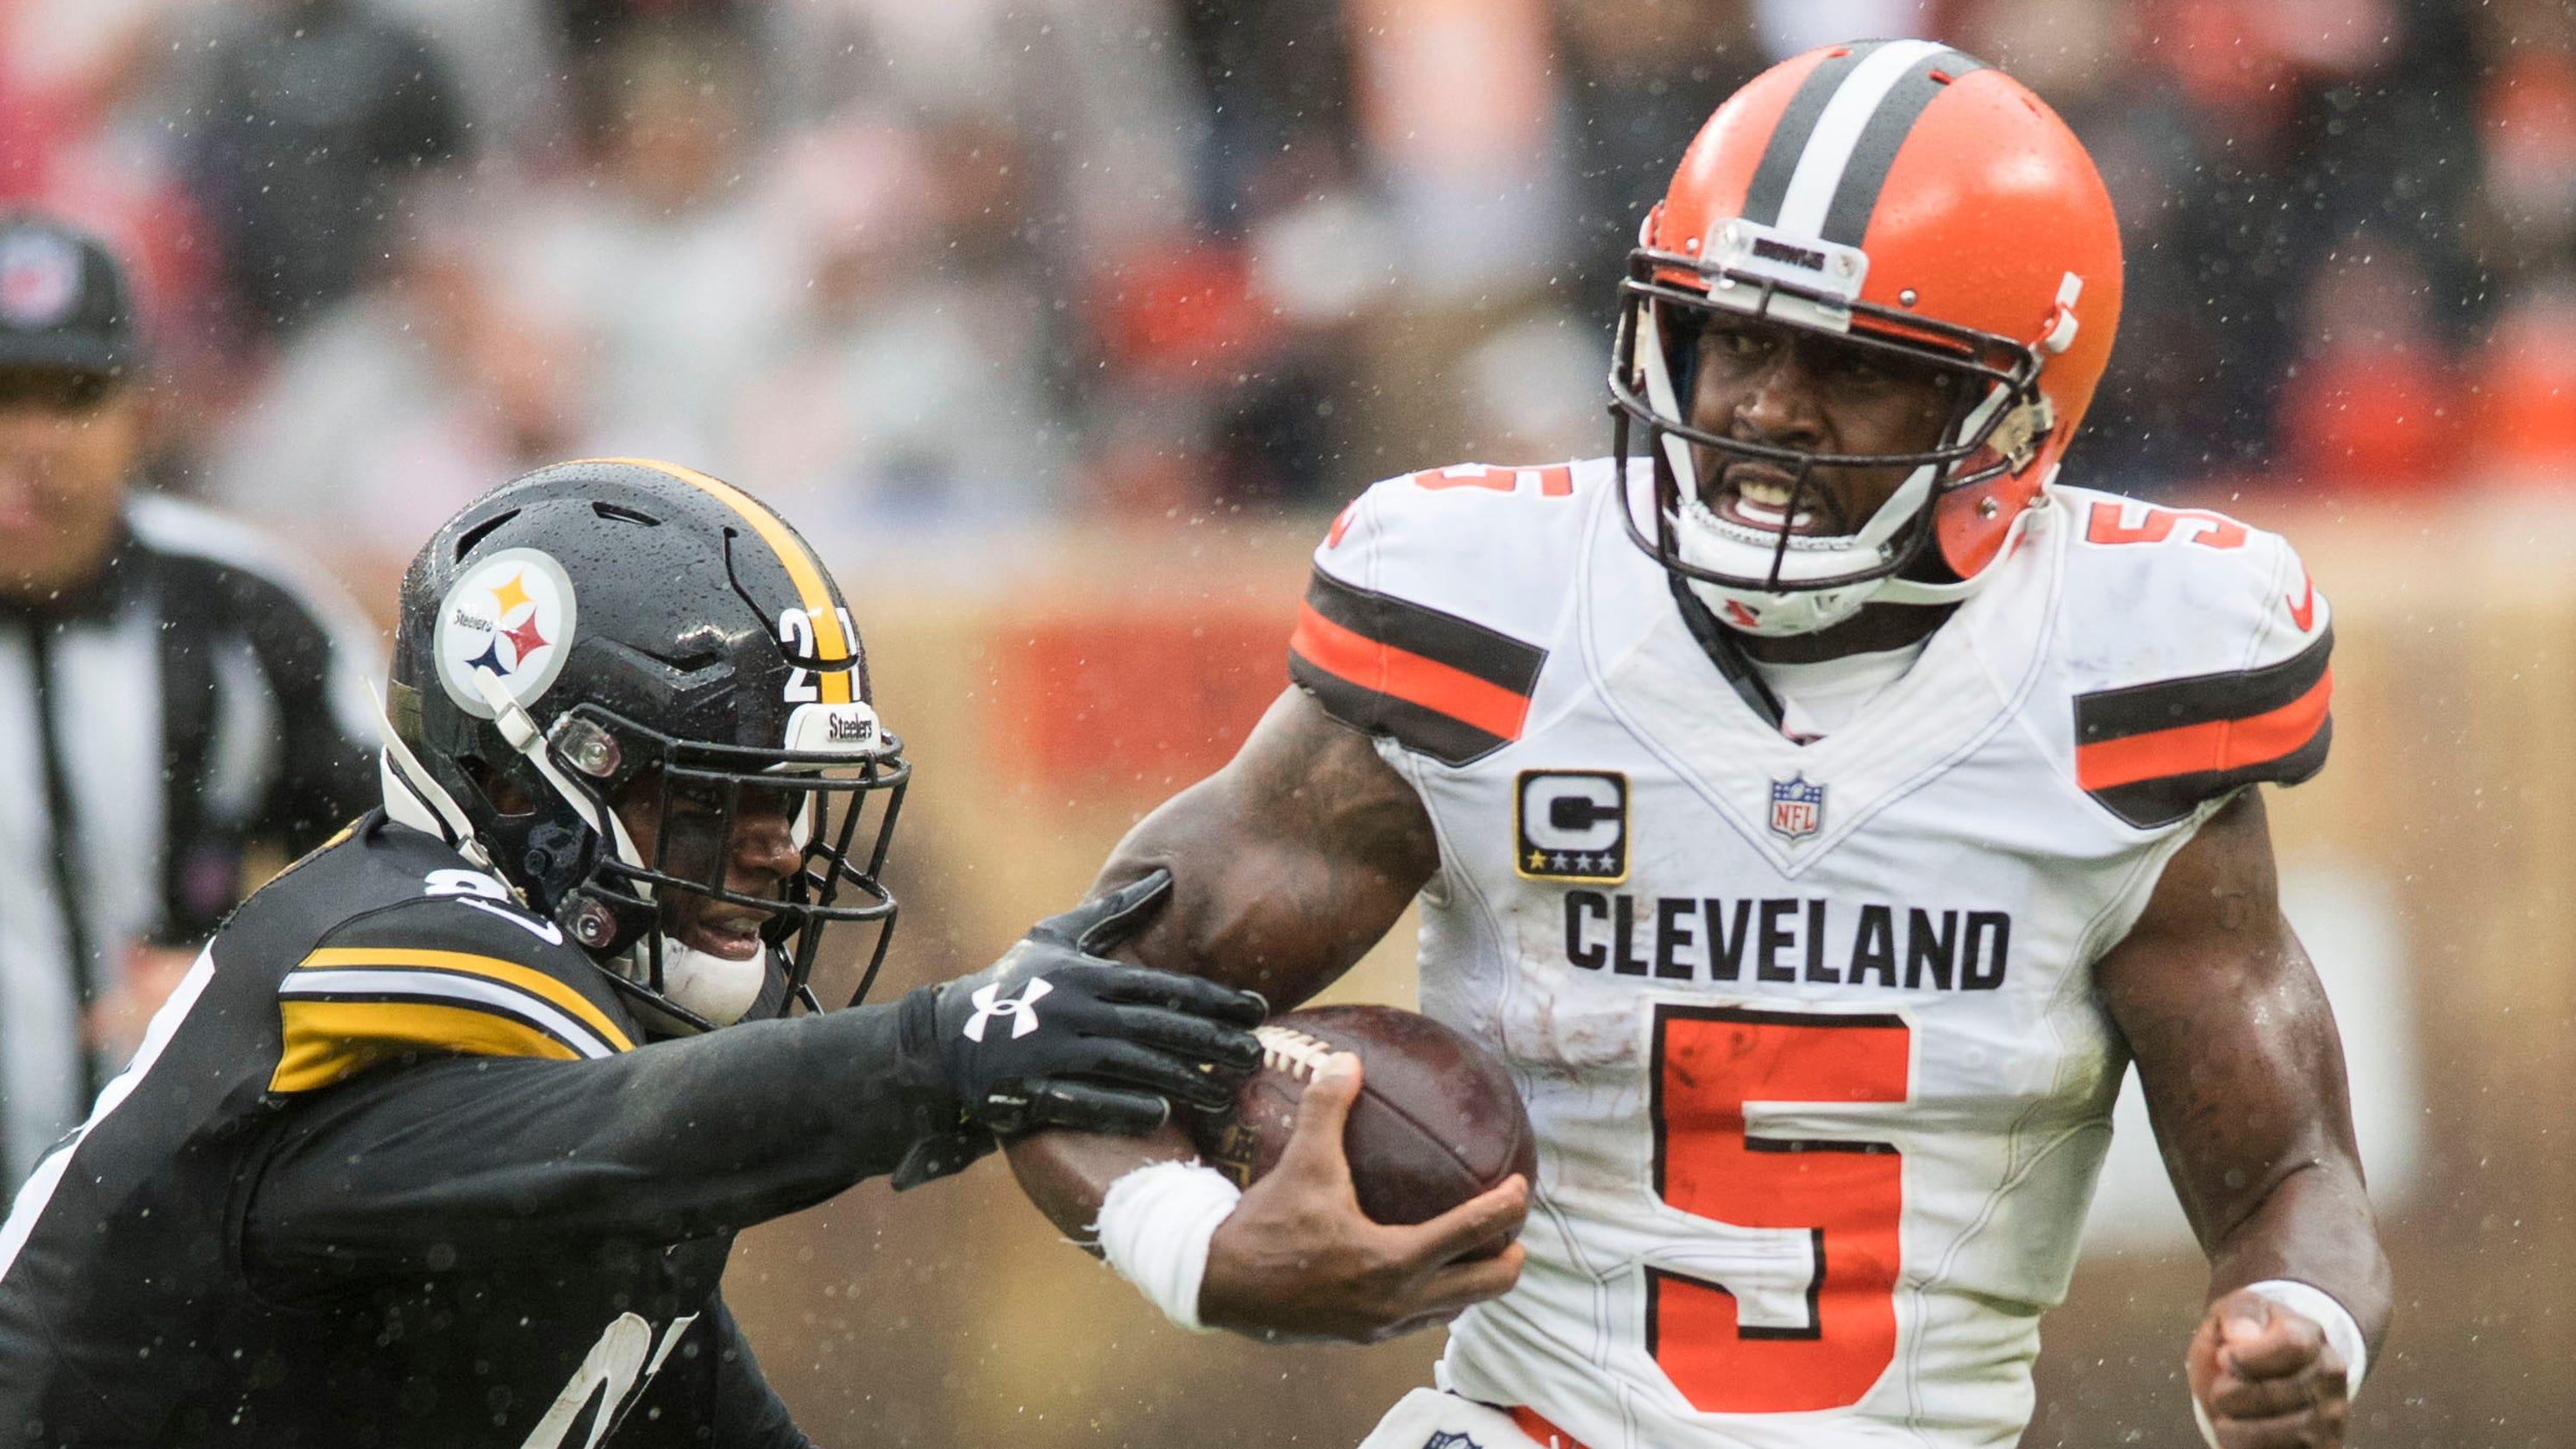 Usatsi Crop Width Height Fit Bounds Browns Scto Tie Steelers  Losing Streak